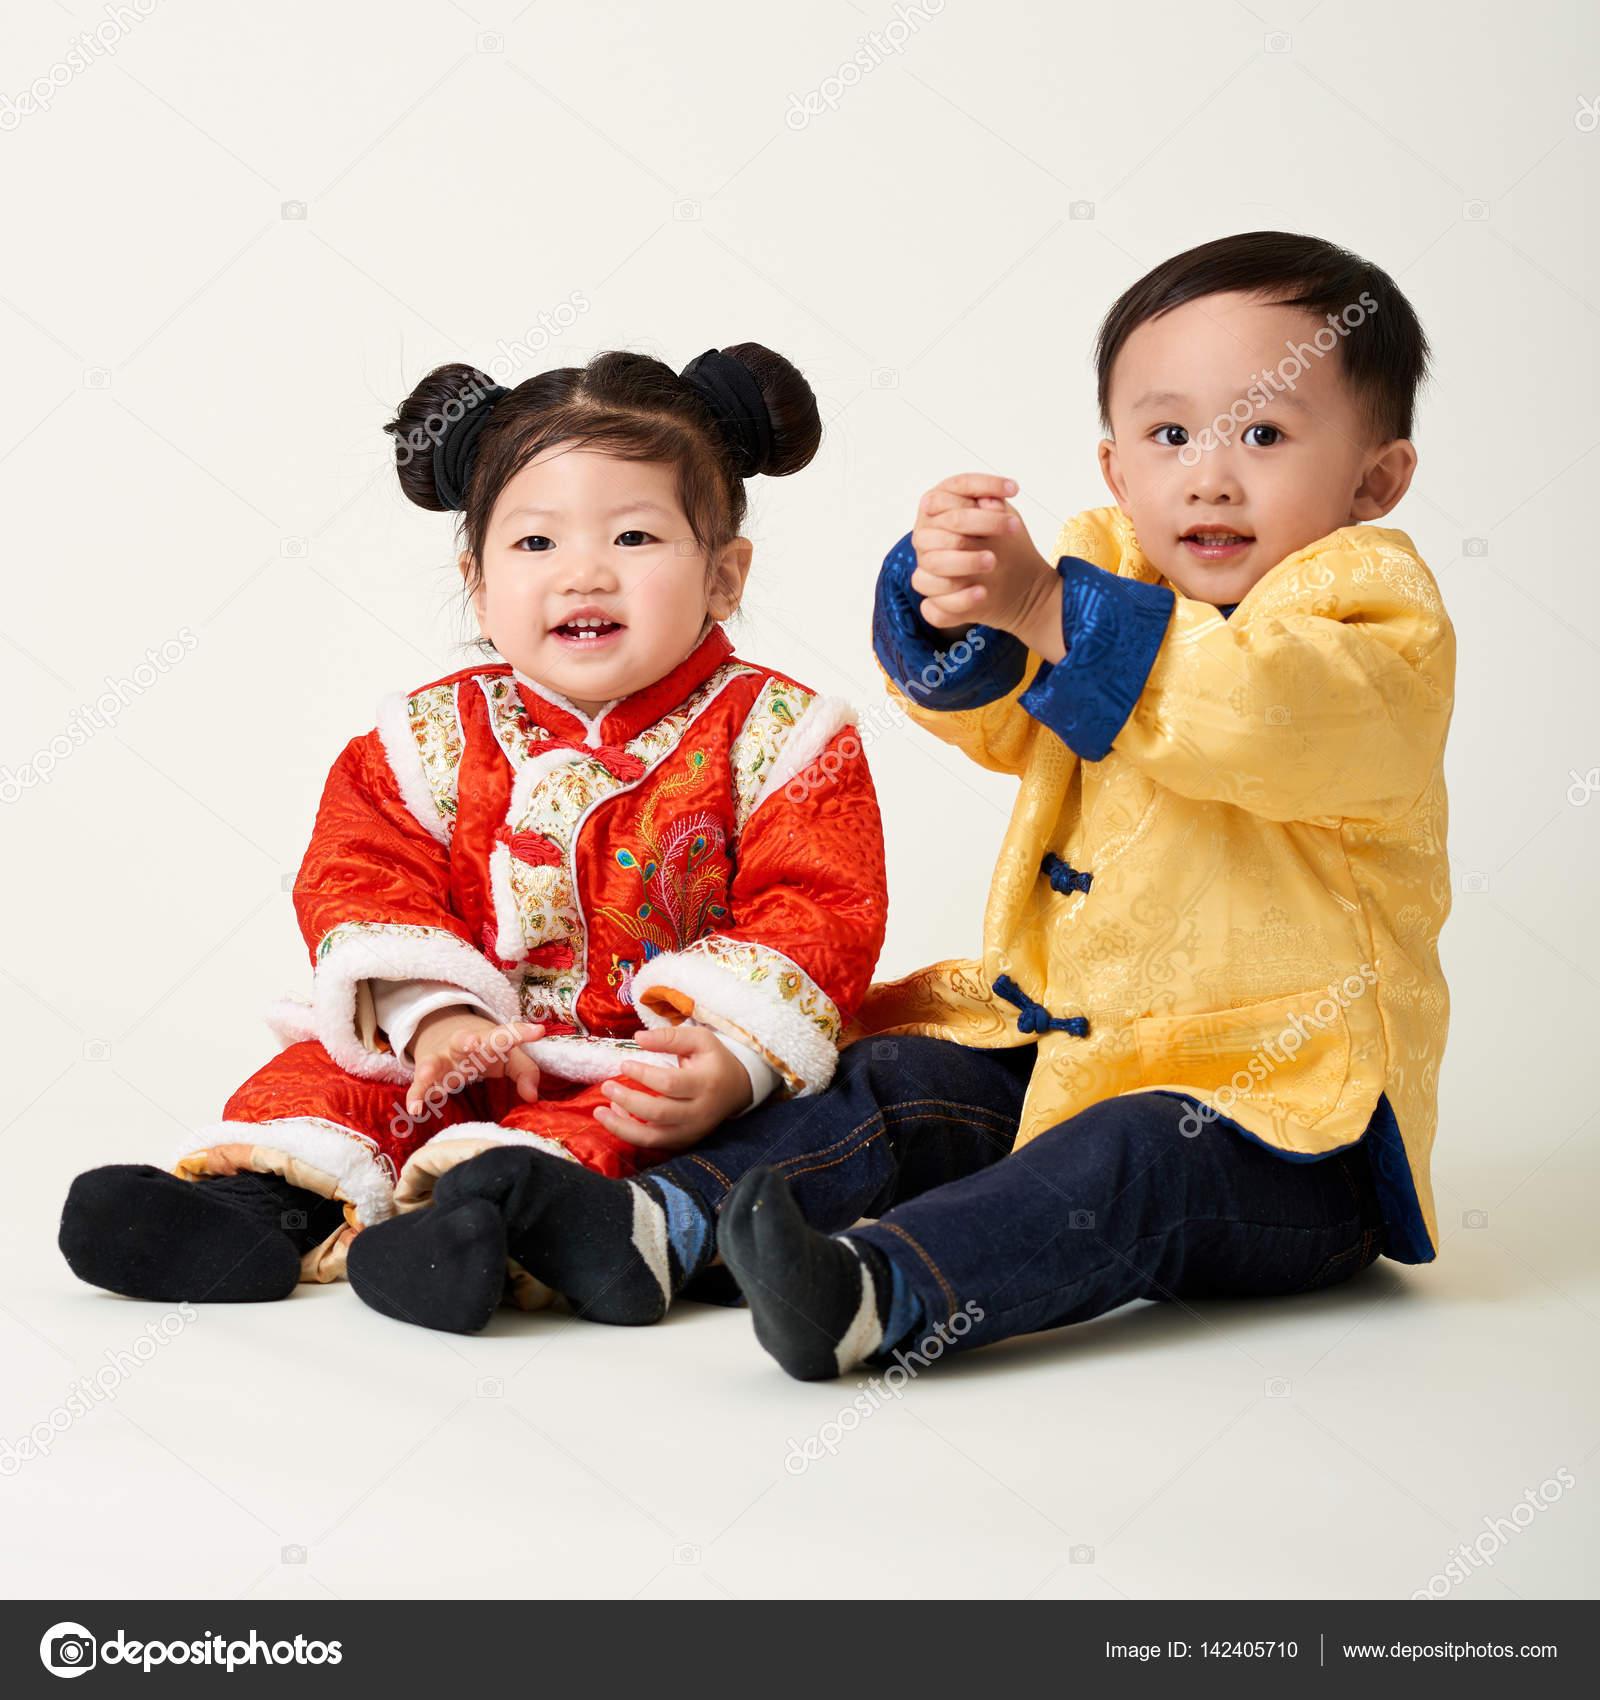 Cinese Cinese Vestito Vestito Cinese Tradizionale Tradizionale Bambino Bambino Vestito Bambino Tradizionale dosCxtQrhB